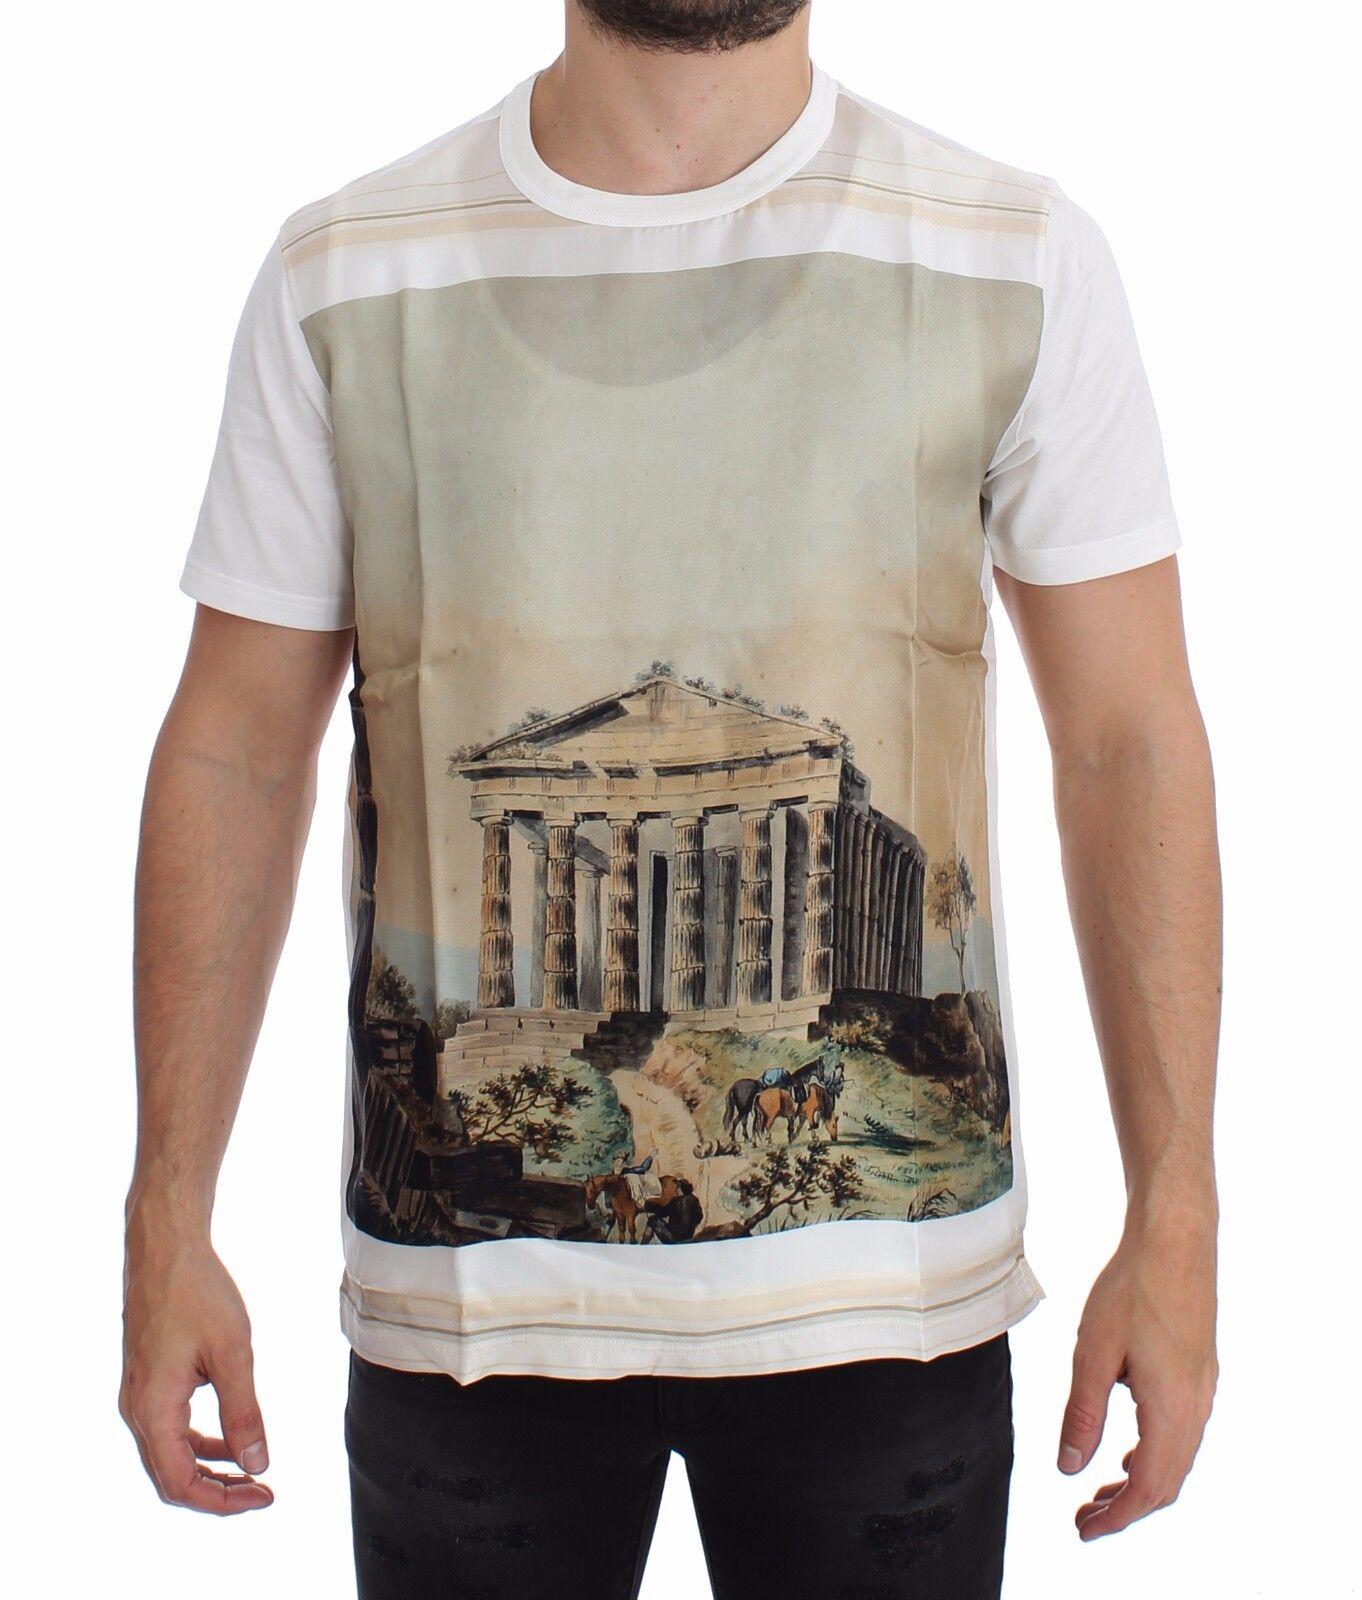 Nuova con Etichetta Dolce & Gabbana Bianco Taormine Stampa Girocollo T-Shirt